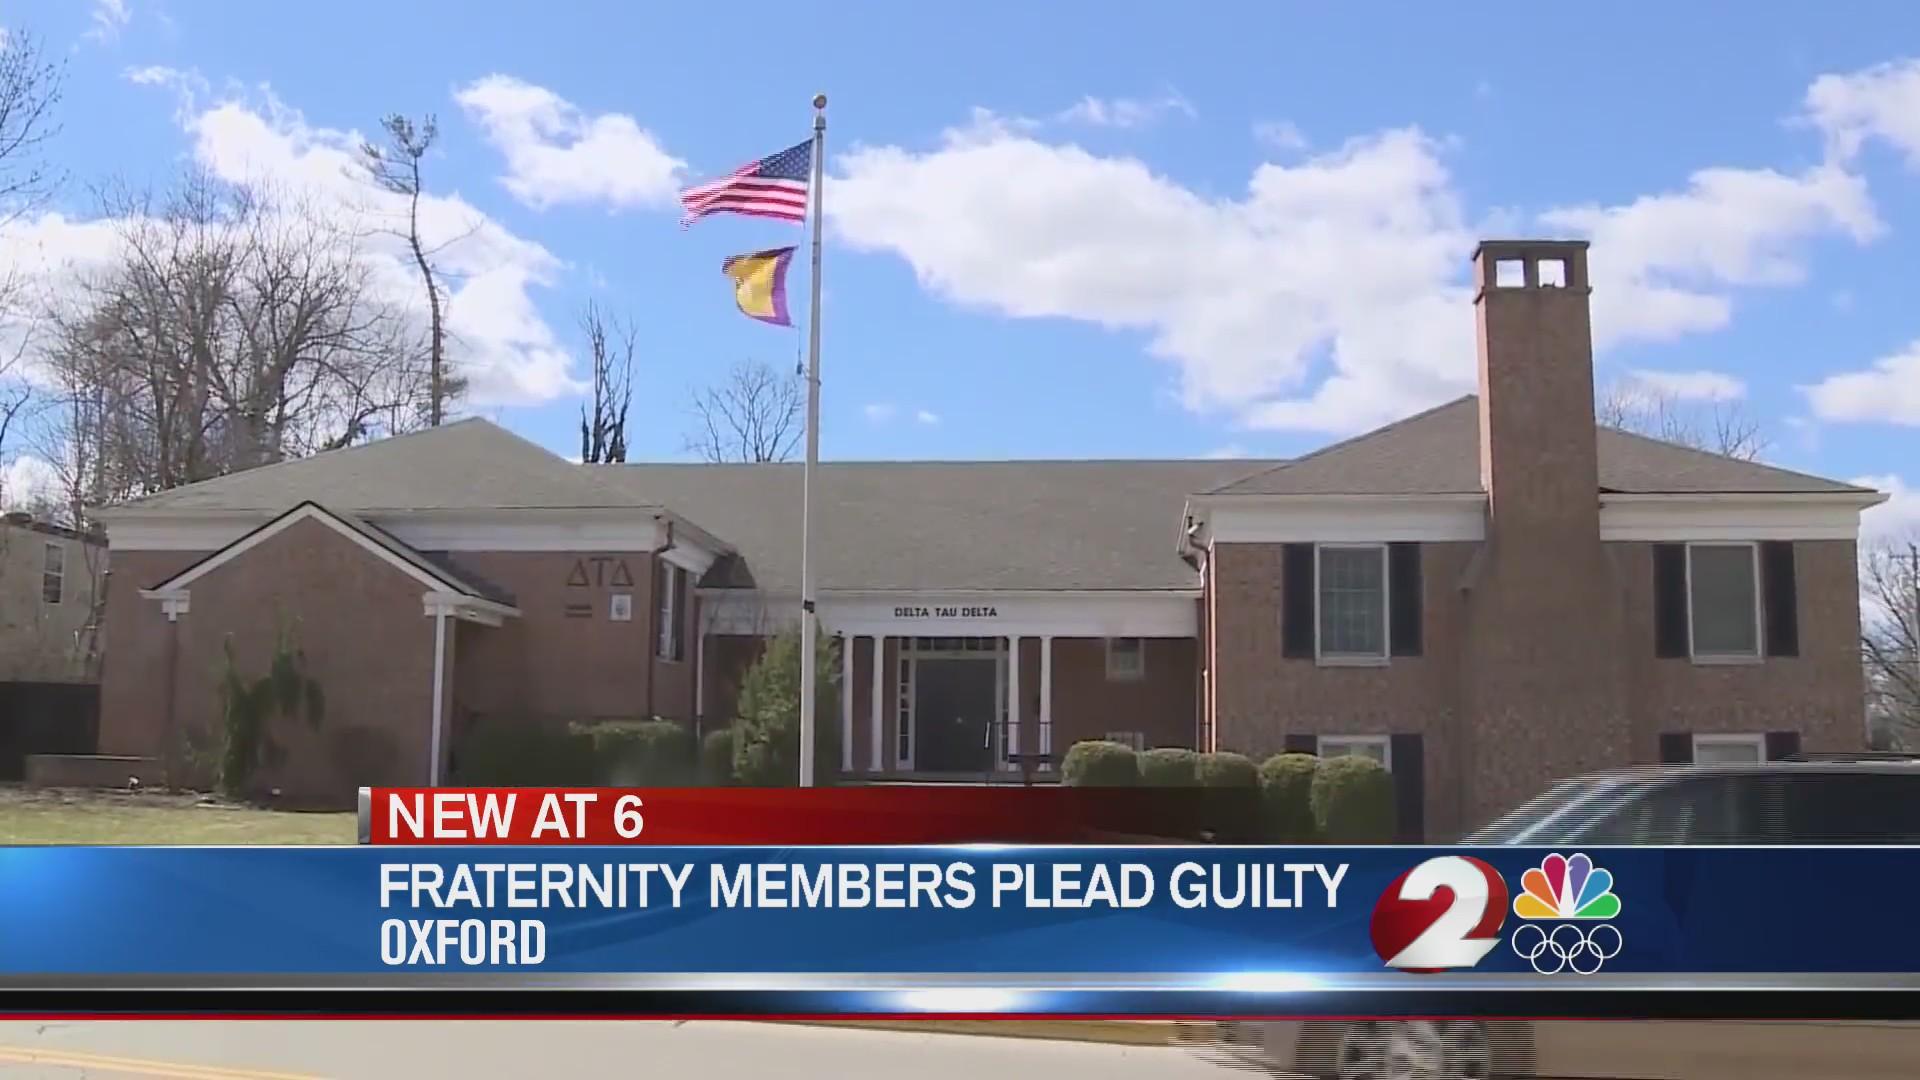 Frat members plead guilty